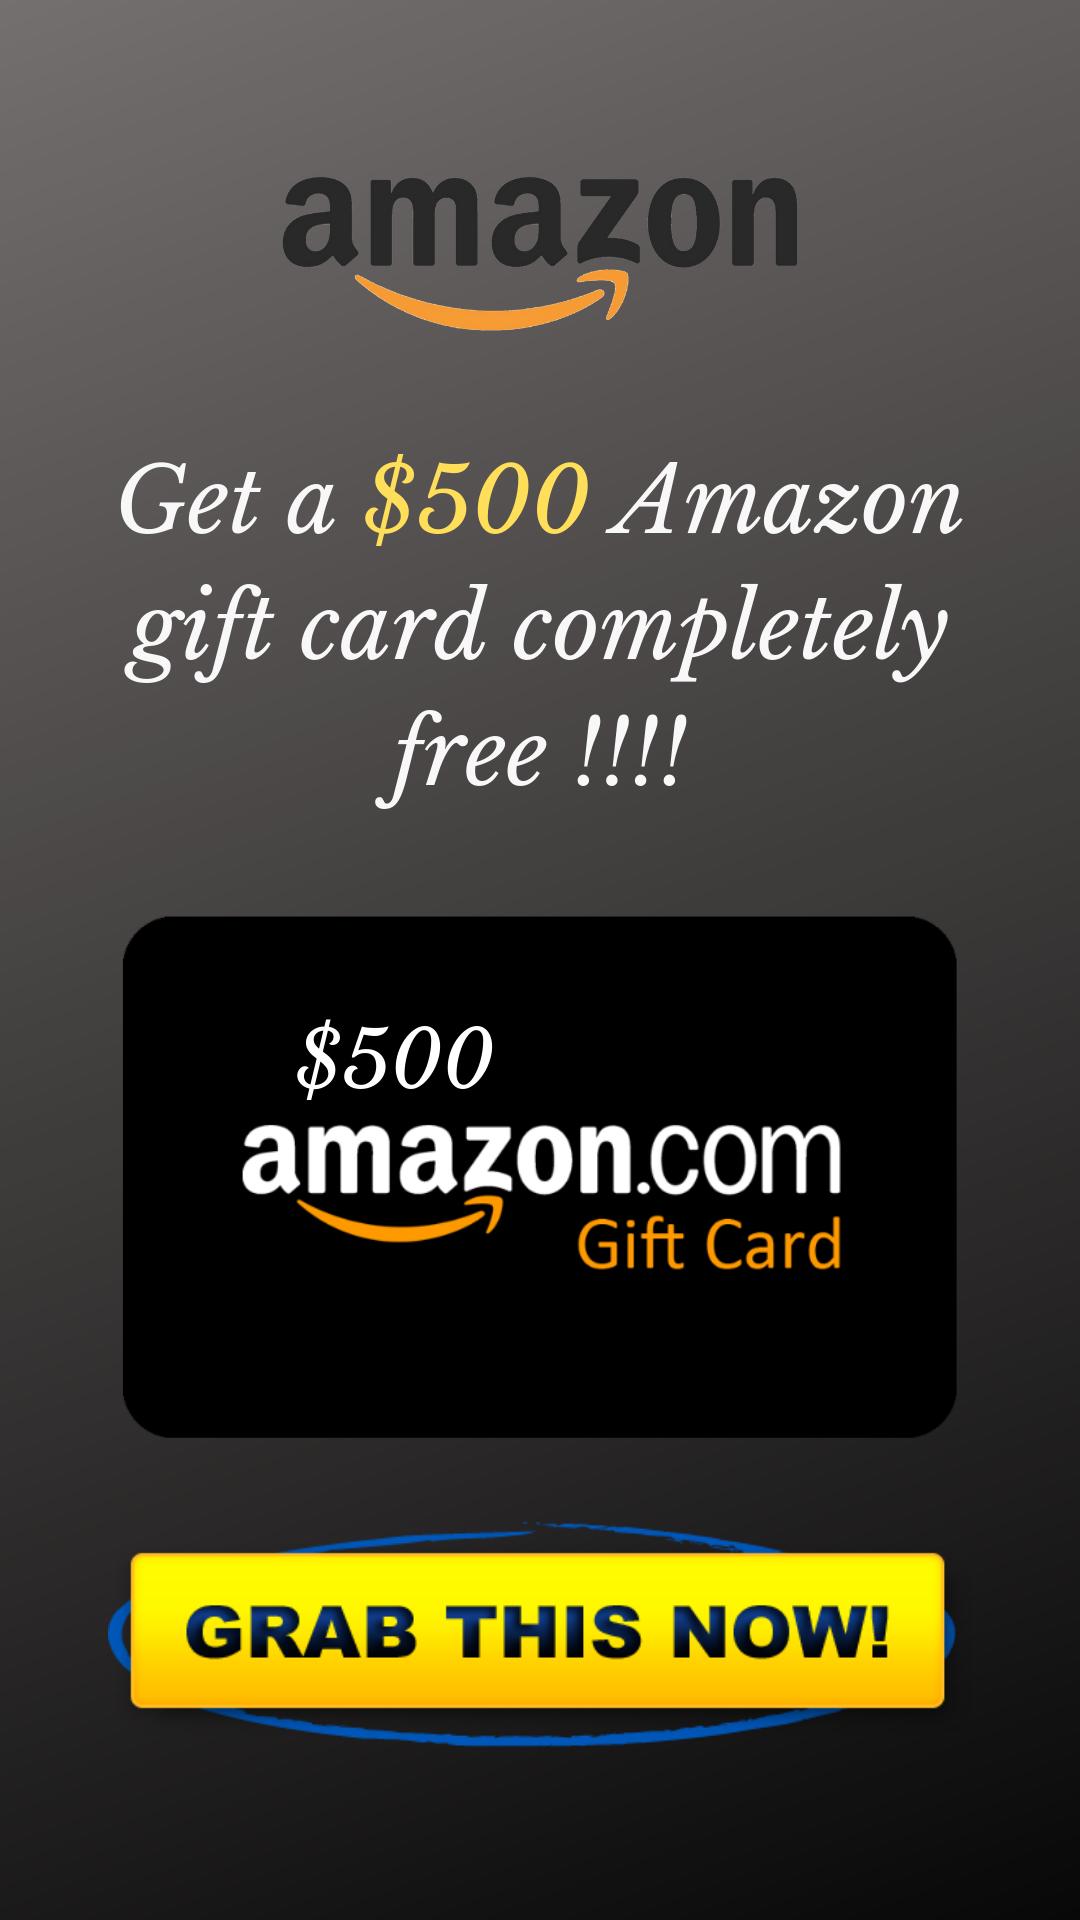 Giveaway Win A 500 Amazon Gift Card Amazon Gift Card Free Amazon Gift Cards Free Itunes Gift Card